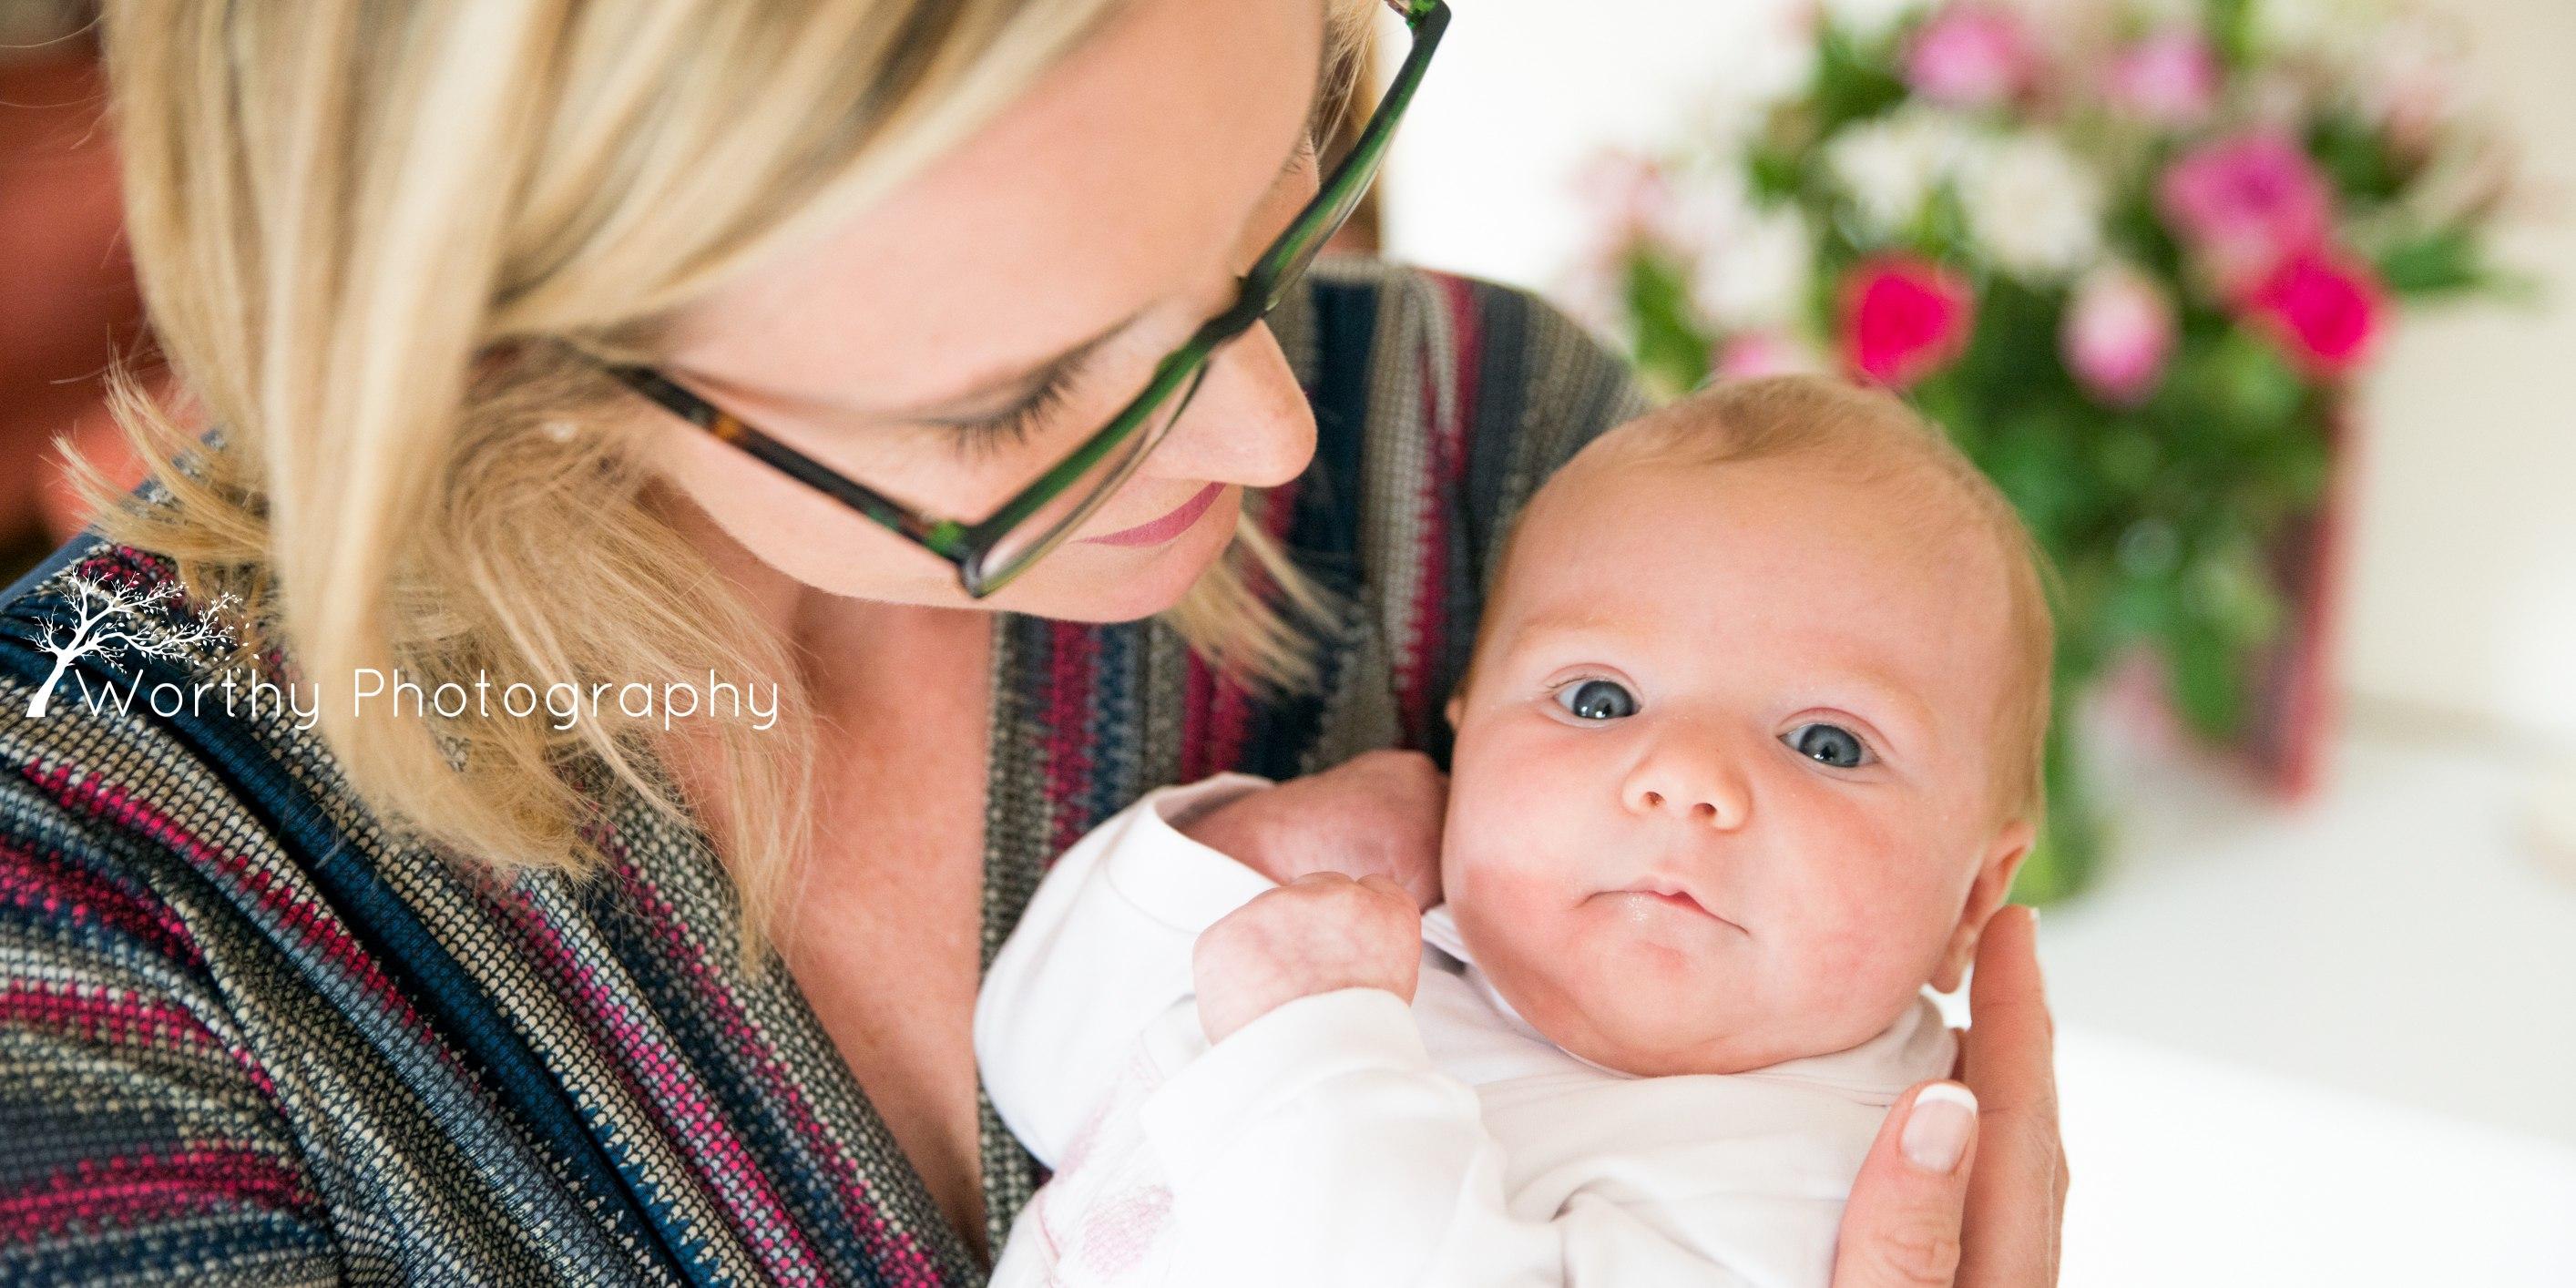 Newborn Photography - Worthy PHotography